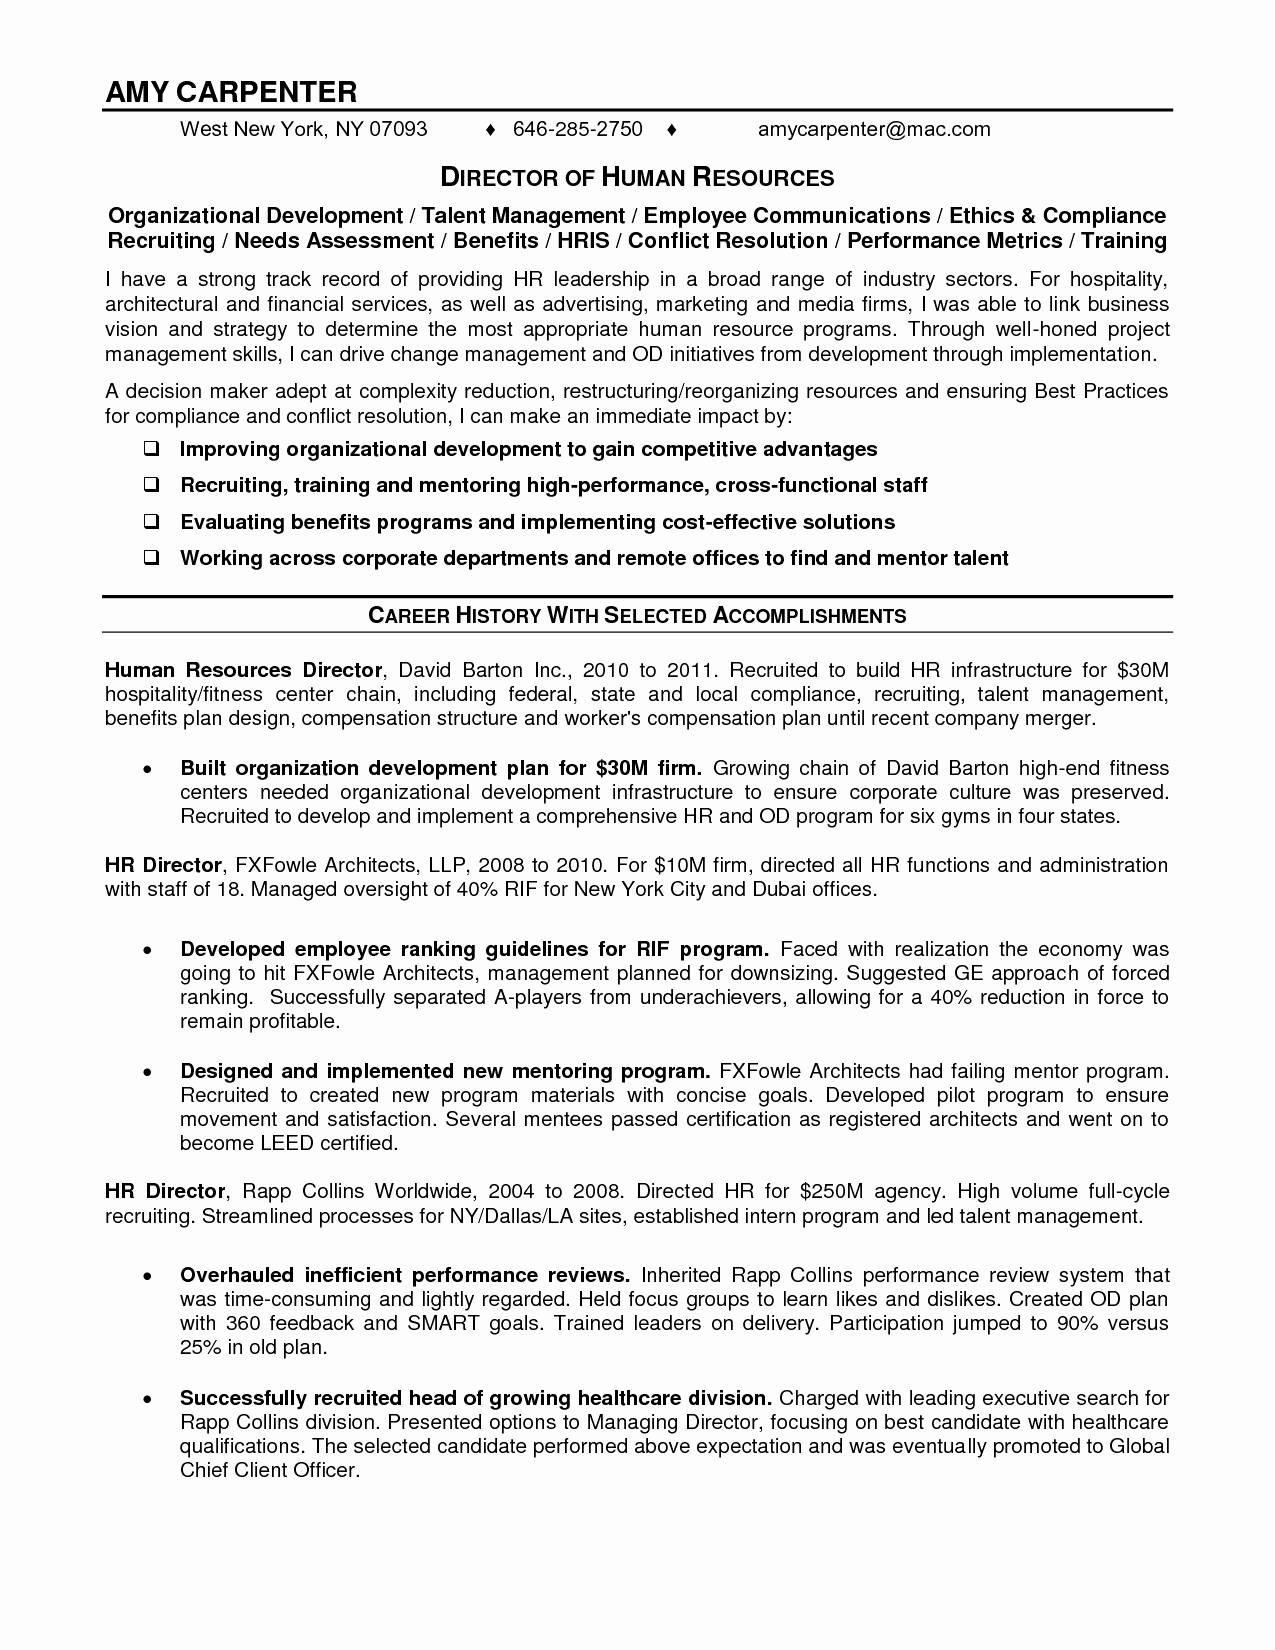 Final Demand Letter Template - Business Expression Interest Letter Template New Dear Hiring